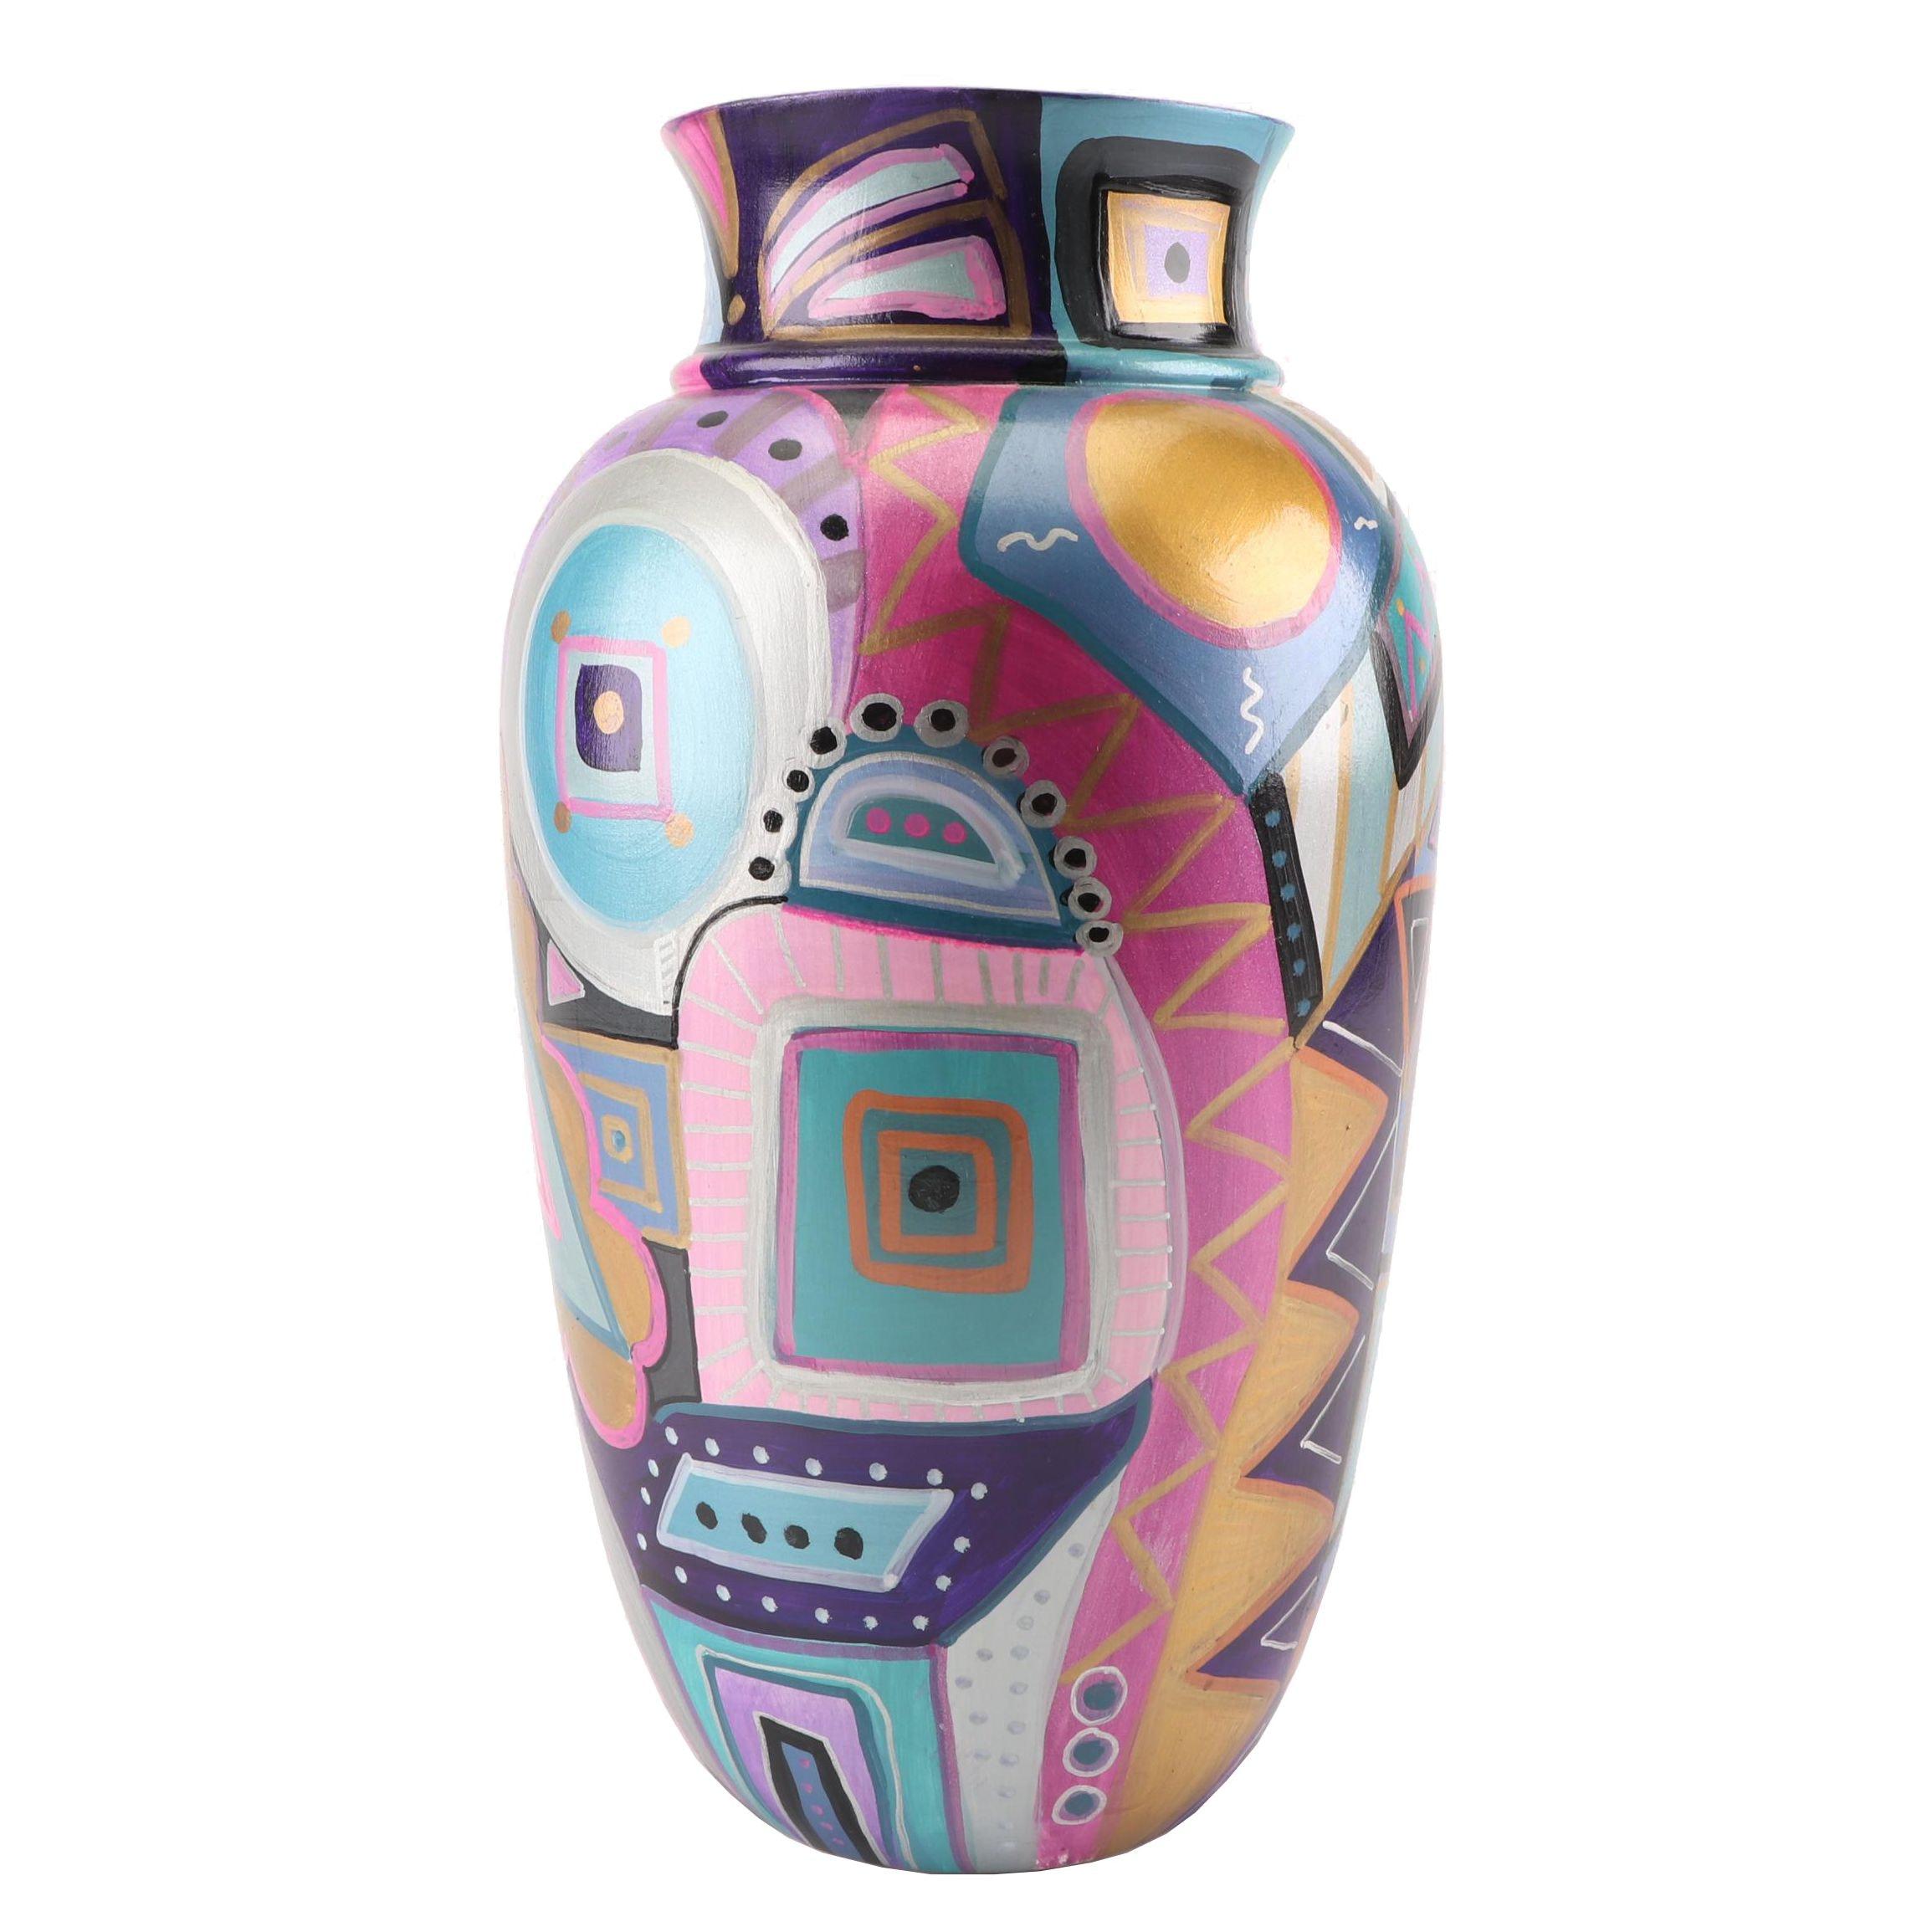 Hand-Painted Suellen Art Pottery Vase, 1996